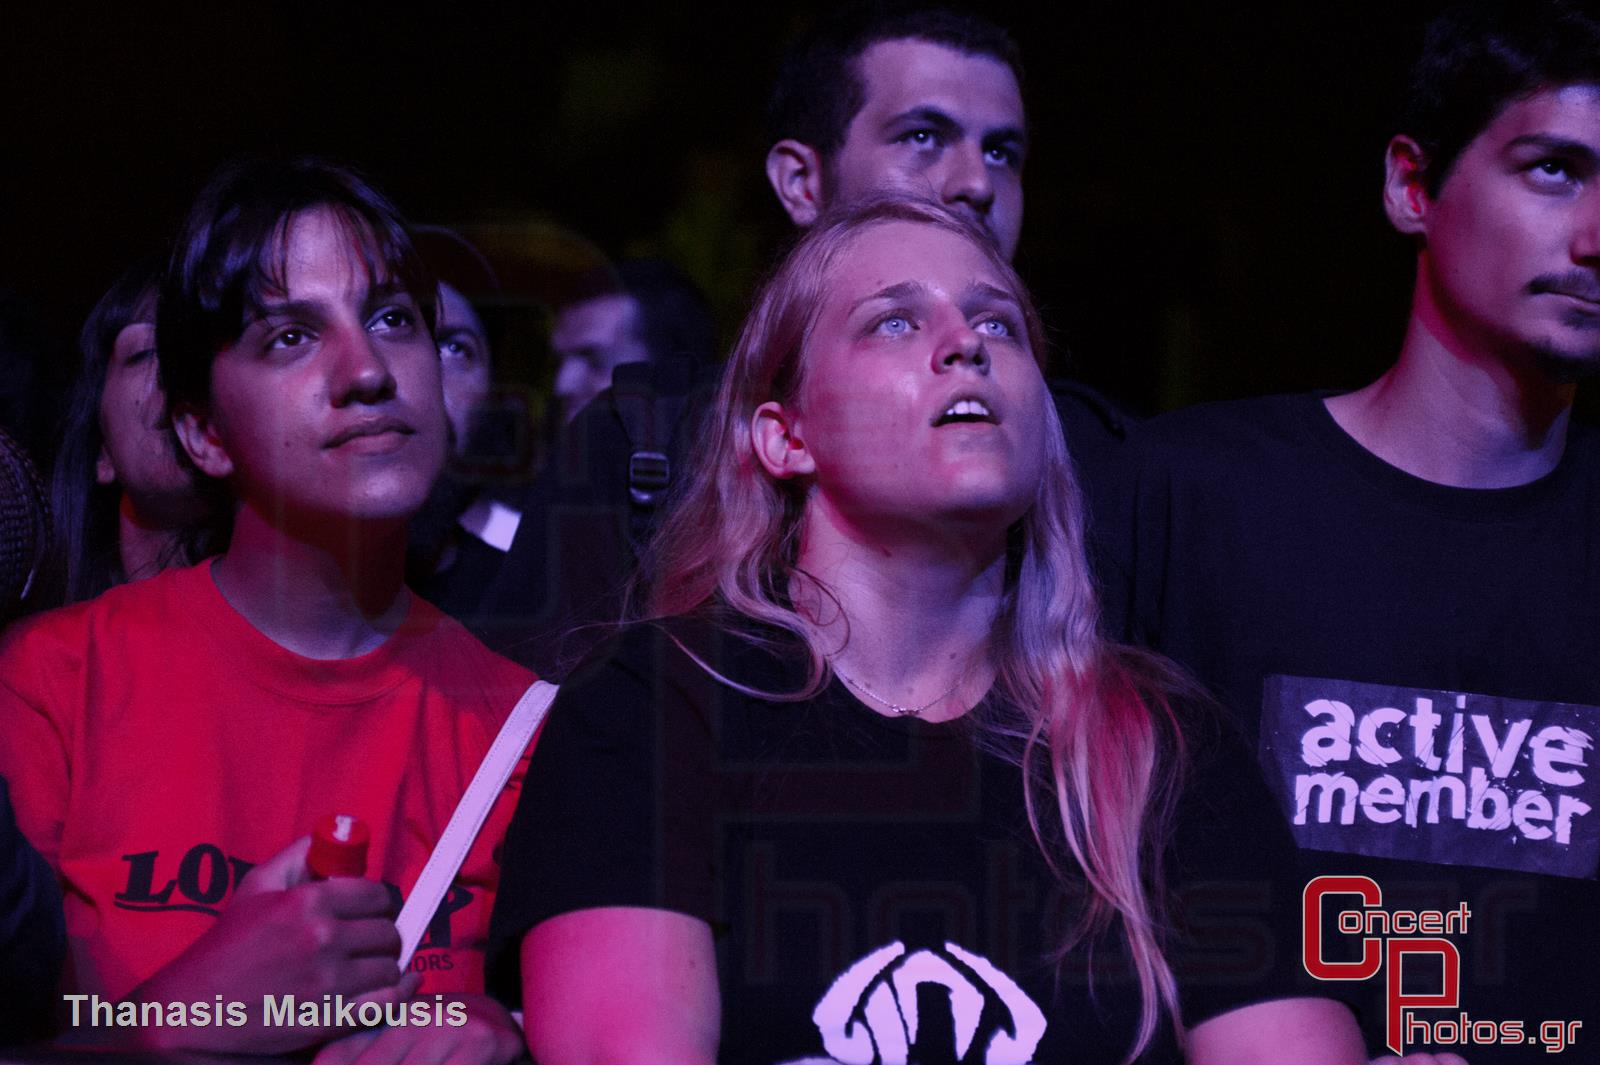 Active Member - Τραγούδα μας να φύγει το σκοτάδι- photographer: Thanasis Maikousis - concertphotos_-5095